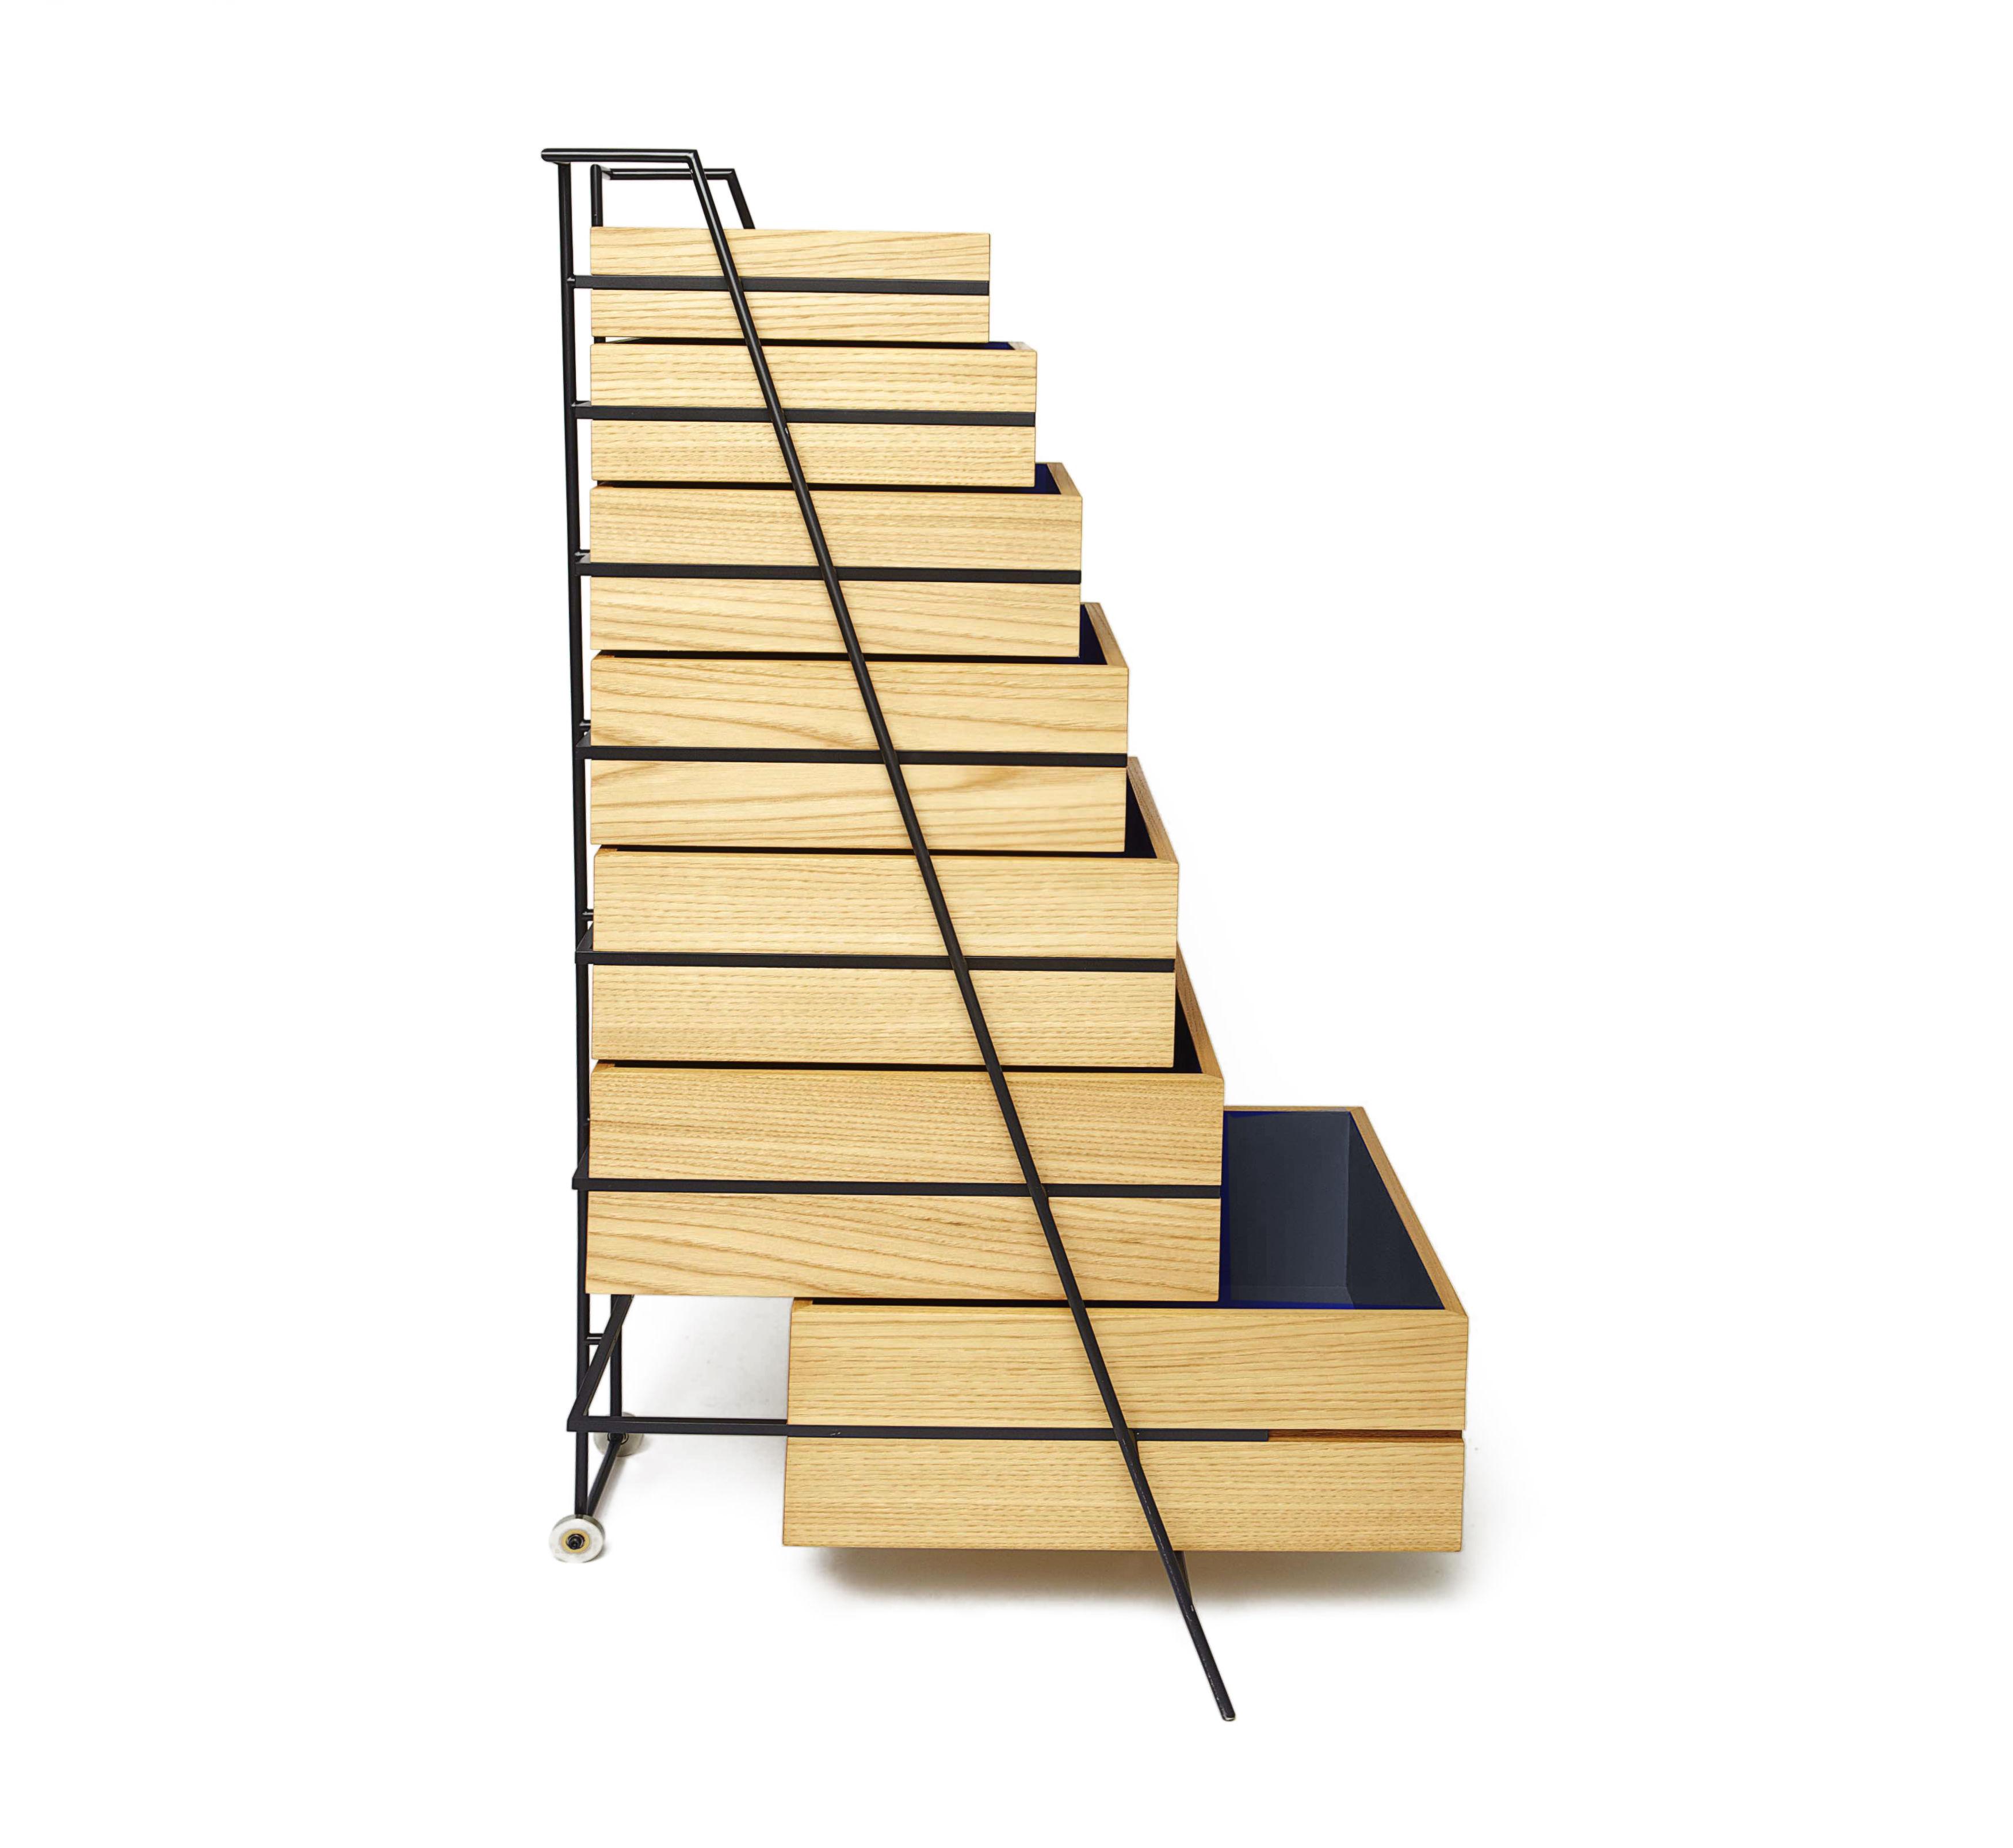 commode sutoa l 67 x h 110 cm bois naturel int rieur bleu frama. Black Bedroom Furniture Sets. Home Design Ideas